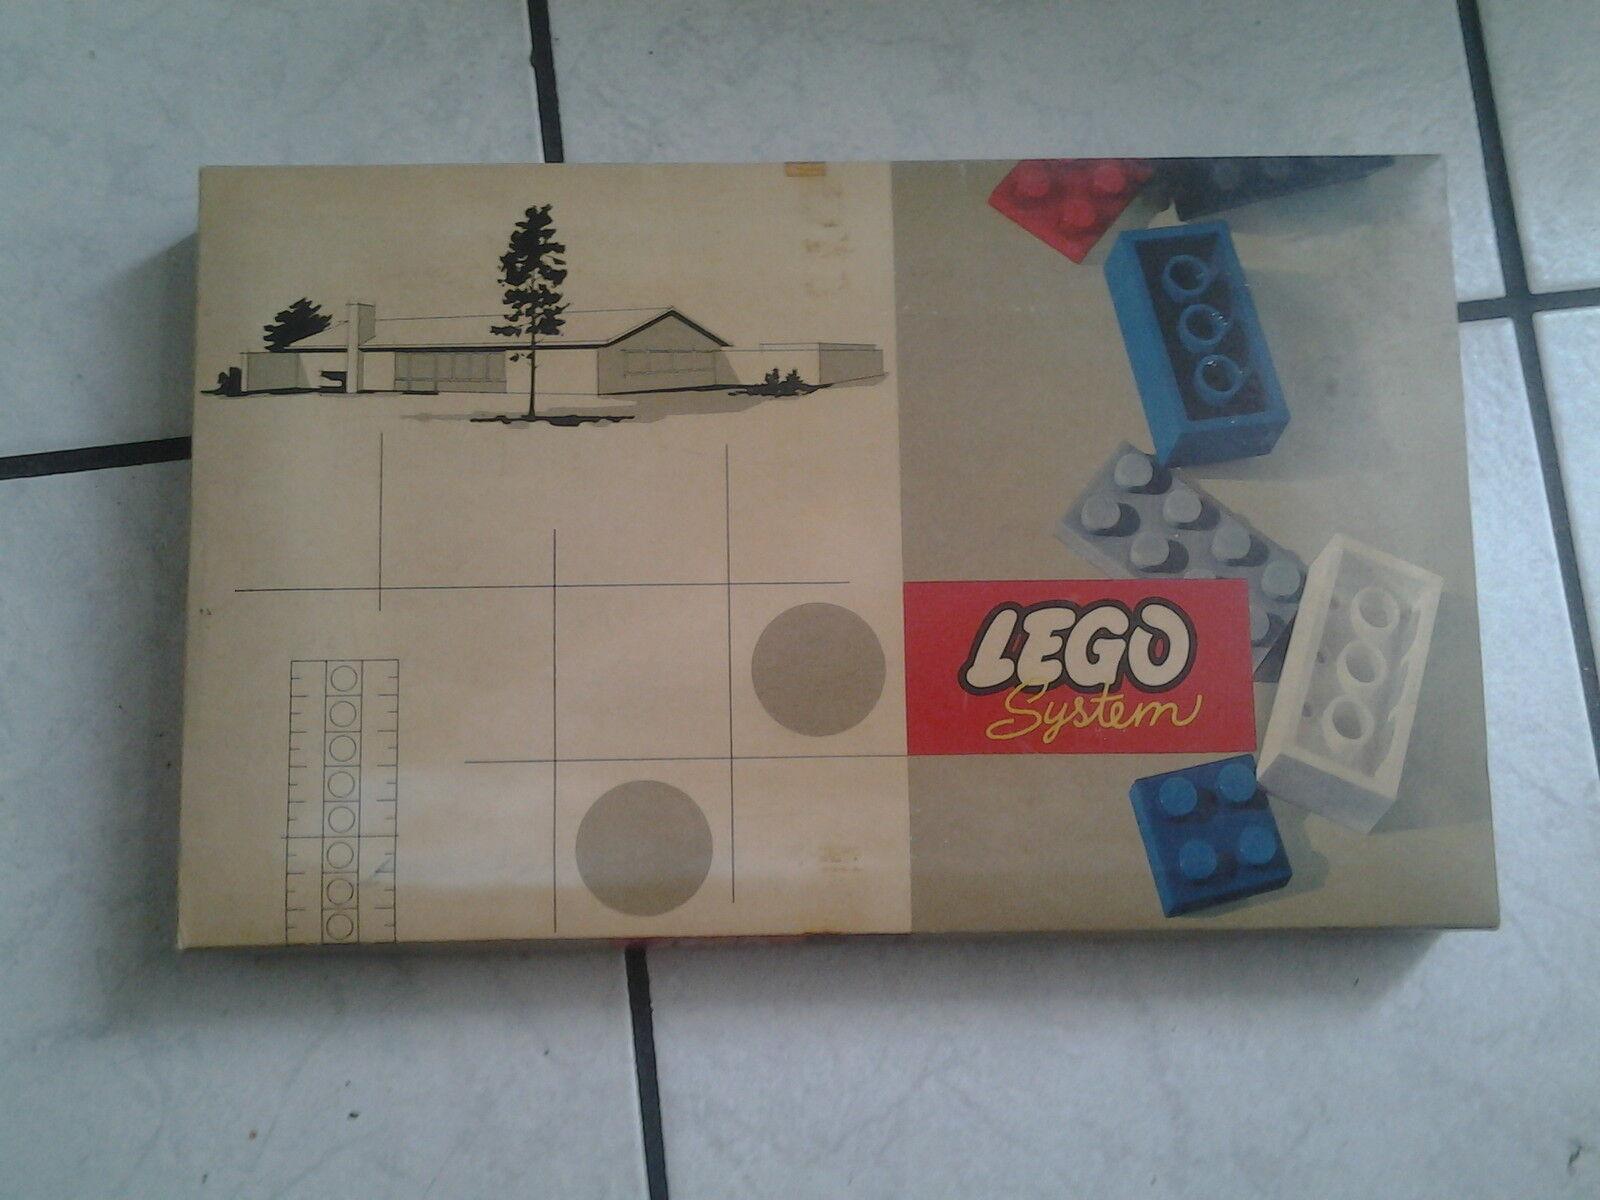 Lego  Packung Packung Packung aus den 50 60 er Jahren- Nr.752   Hobby+Modellbau alt-super b79e43